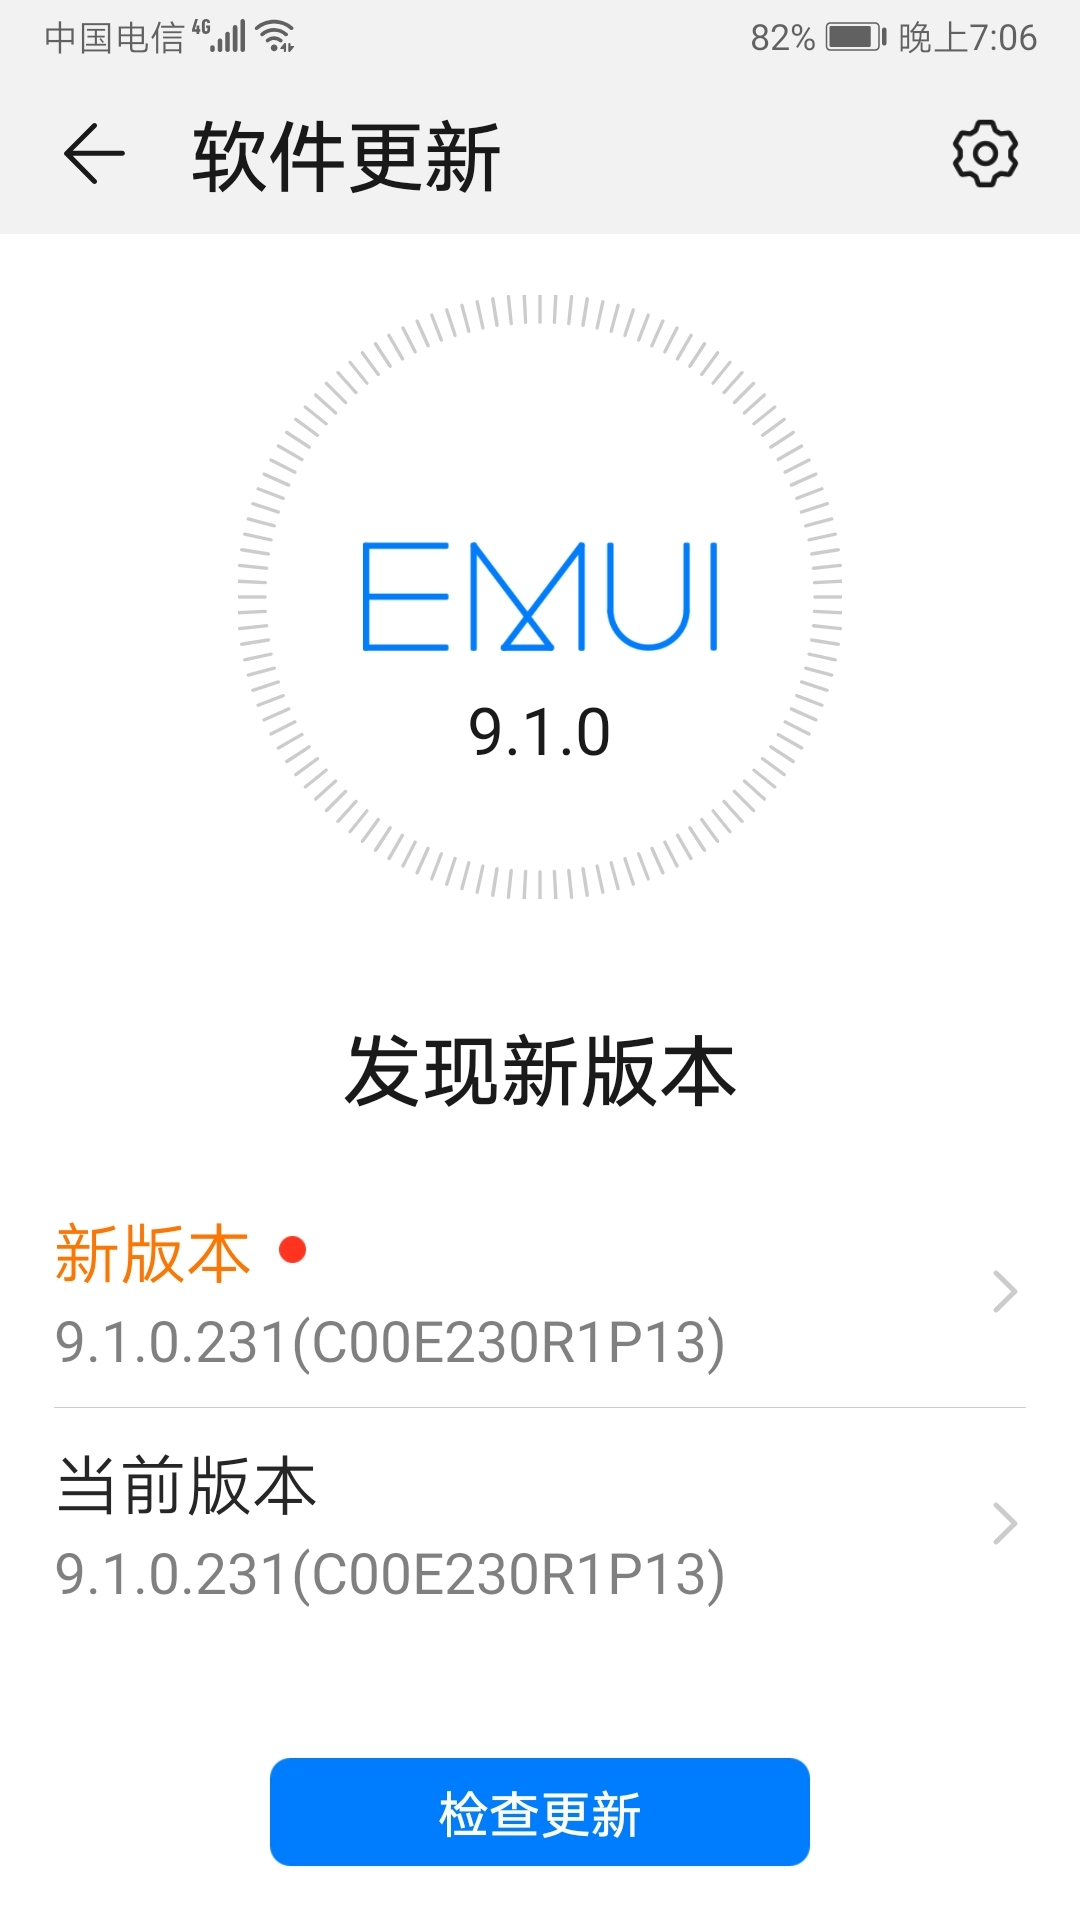 Screenshot_20211003_190630_com.huawei.android.hwouc.jpg